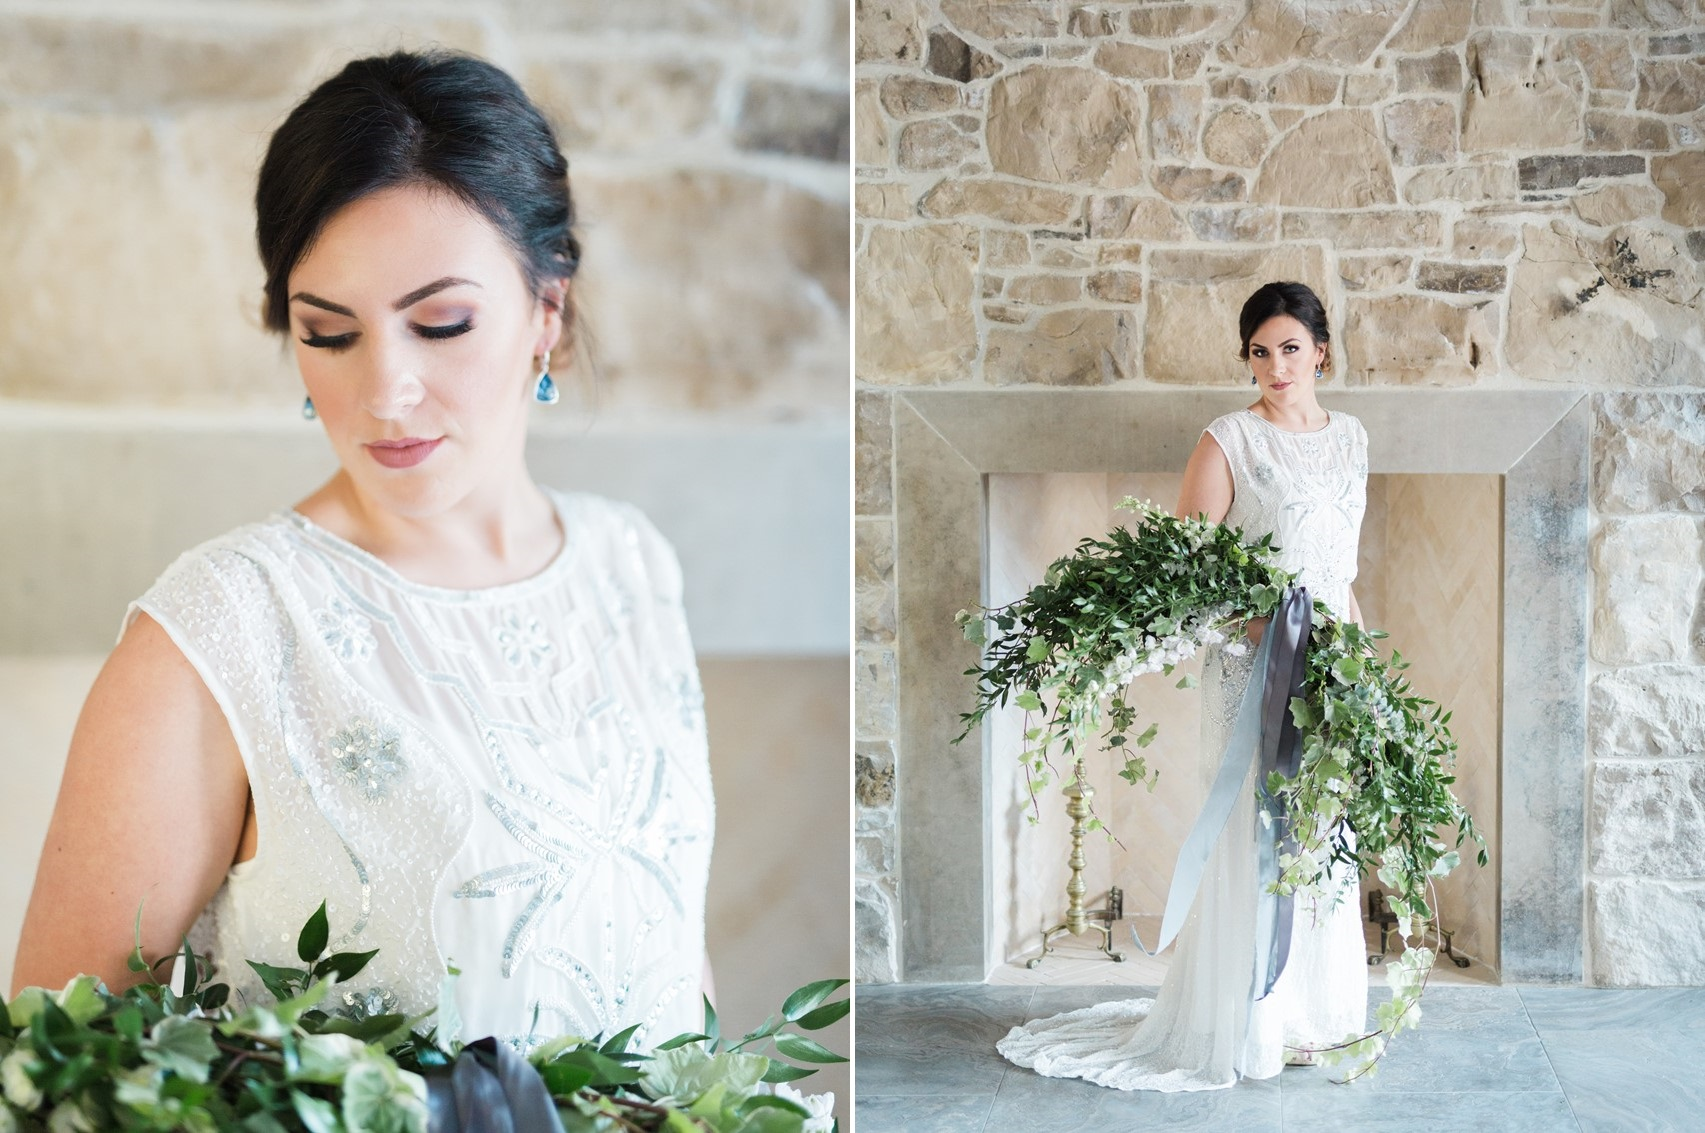 Modern Vintage Bride & Greenery Bridal Bouquet